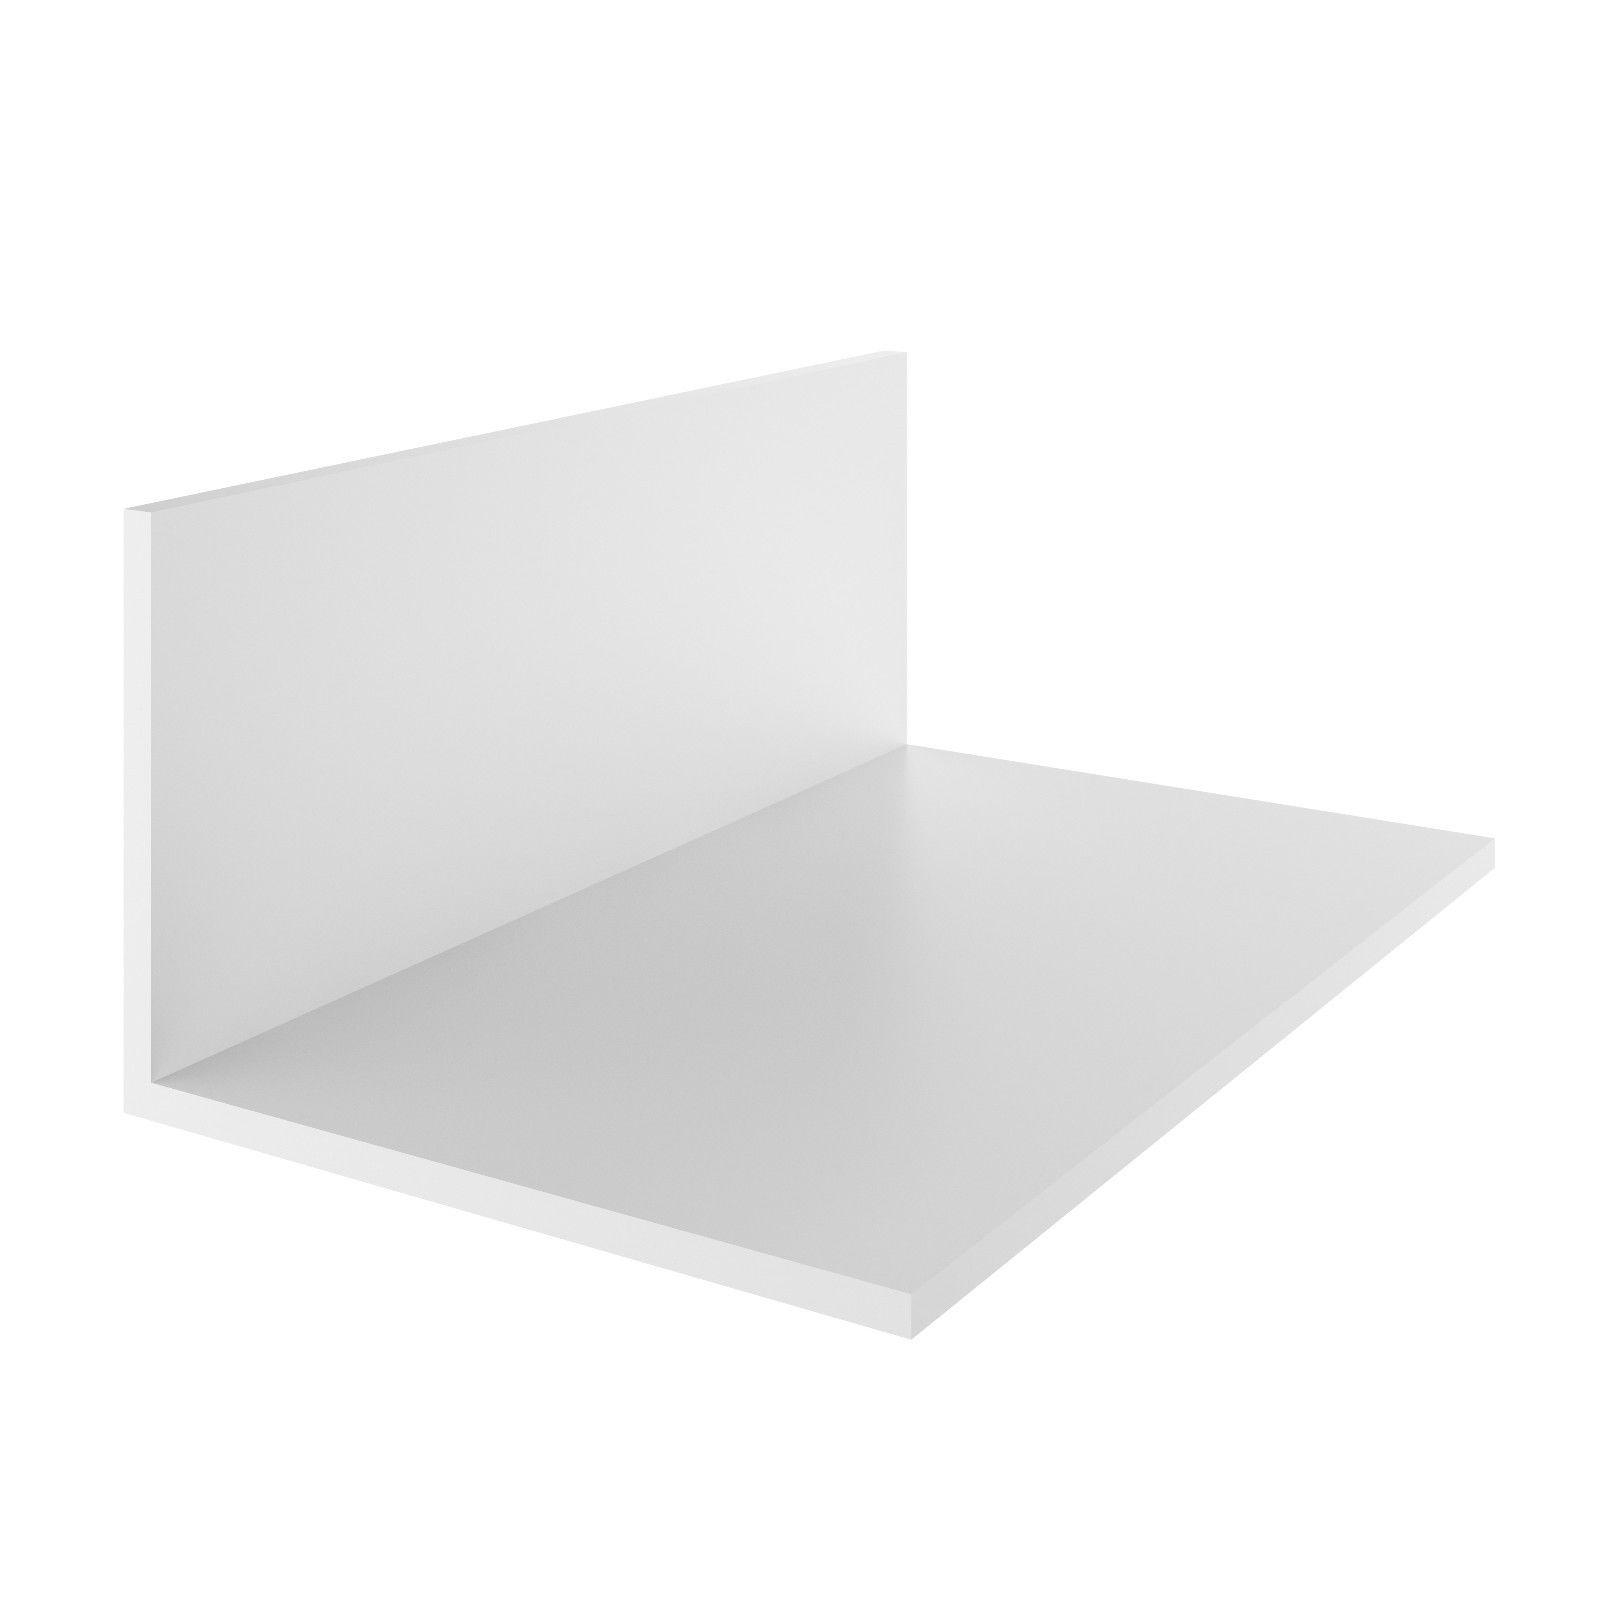 """2,53€/m"" 1,5m Profil Eckleiste Aussenwinkel PVC-Winkel Winkelprofil    45x25 mm"